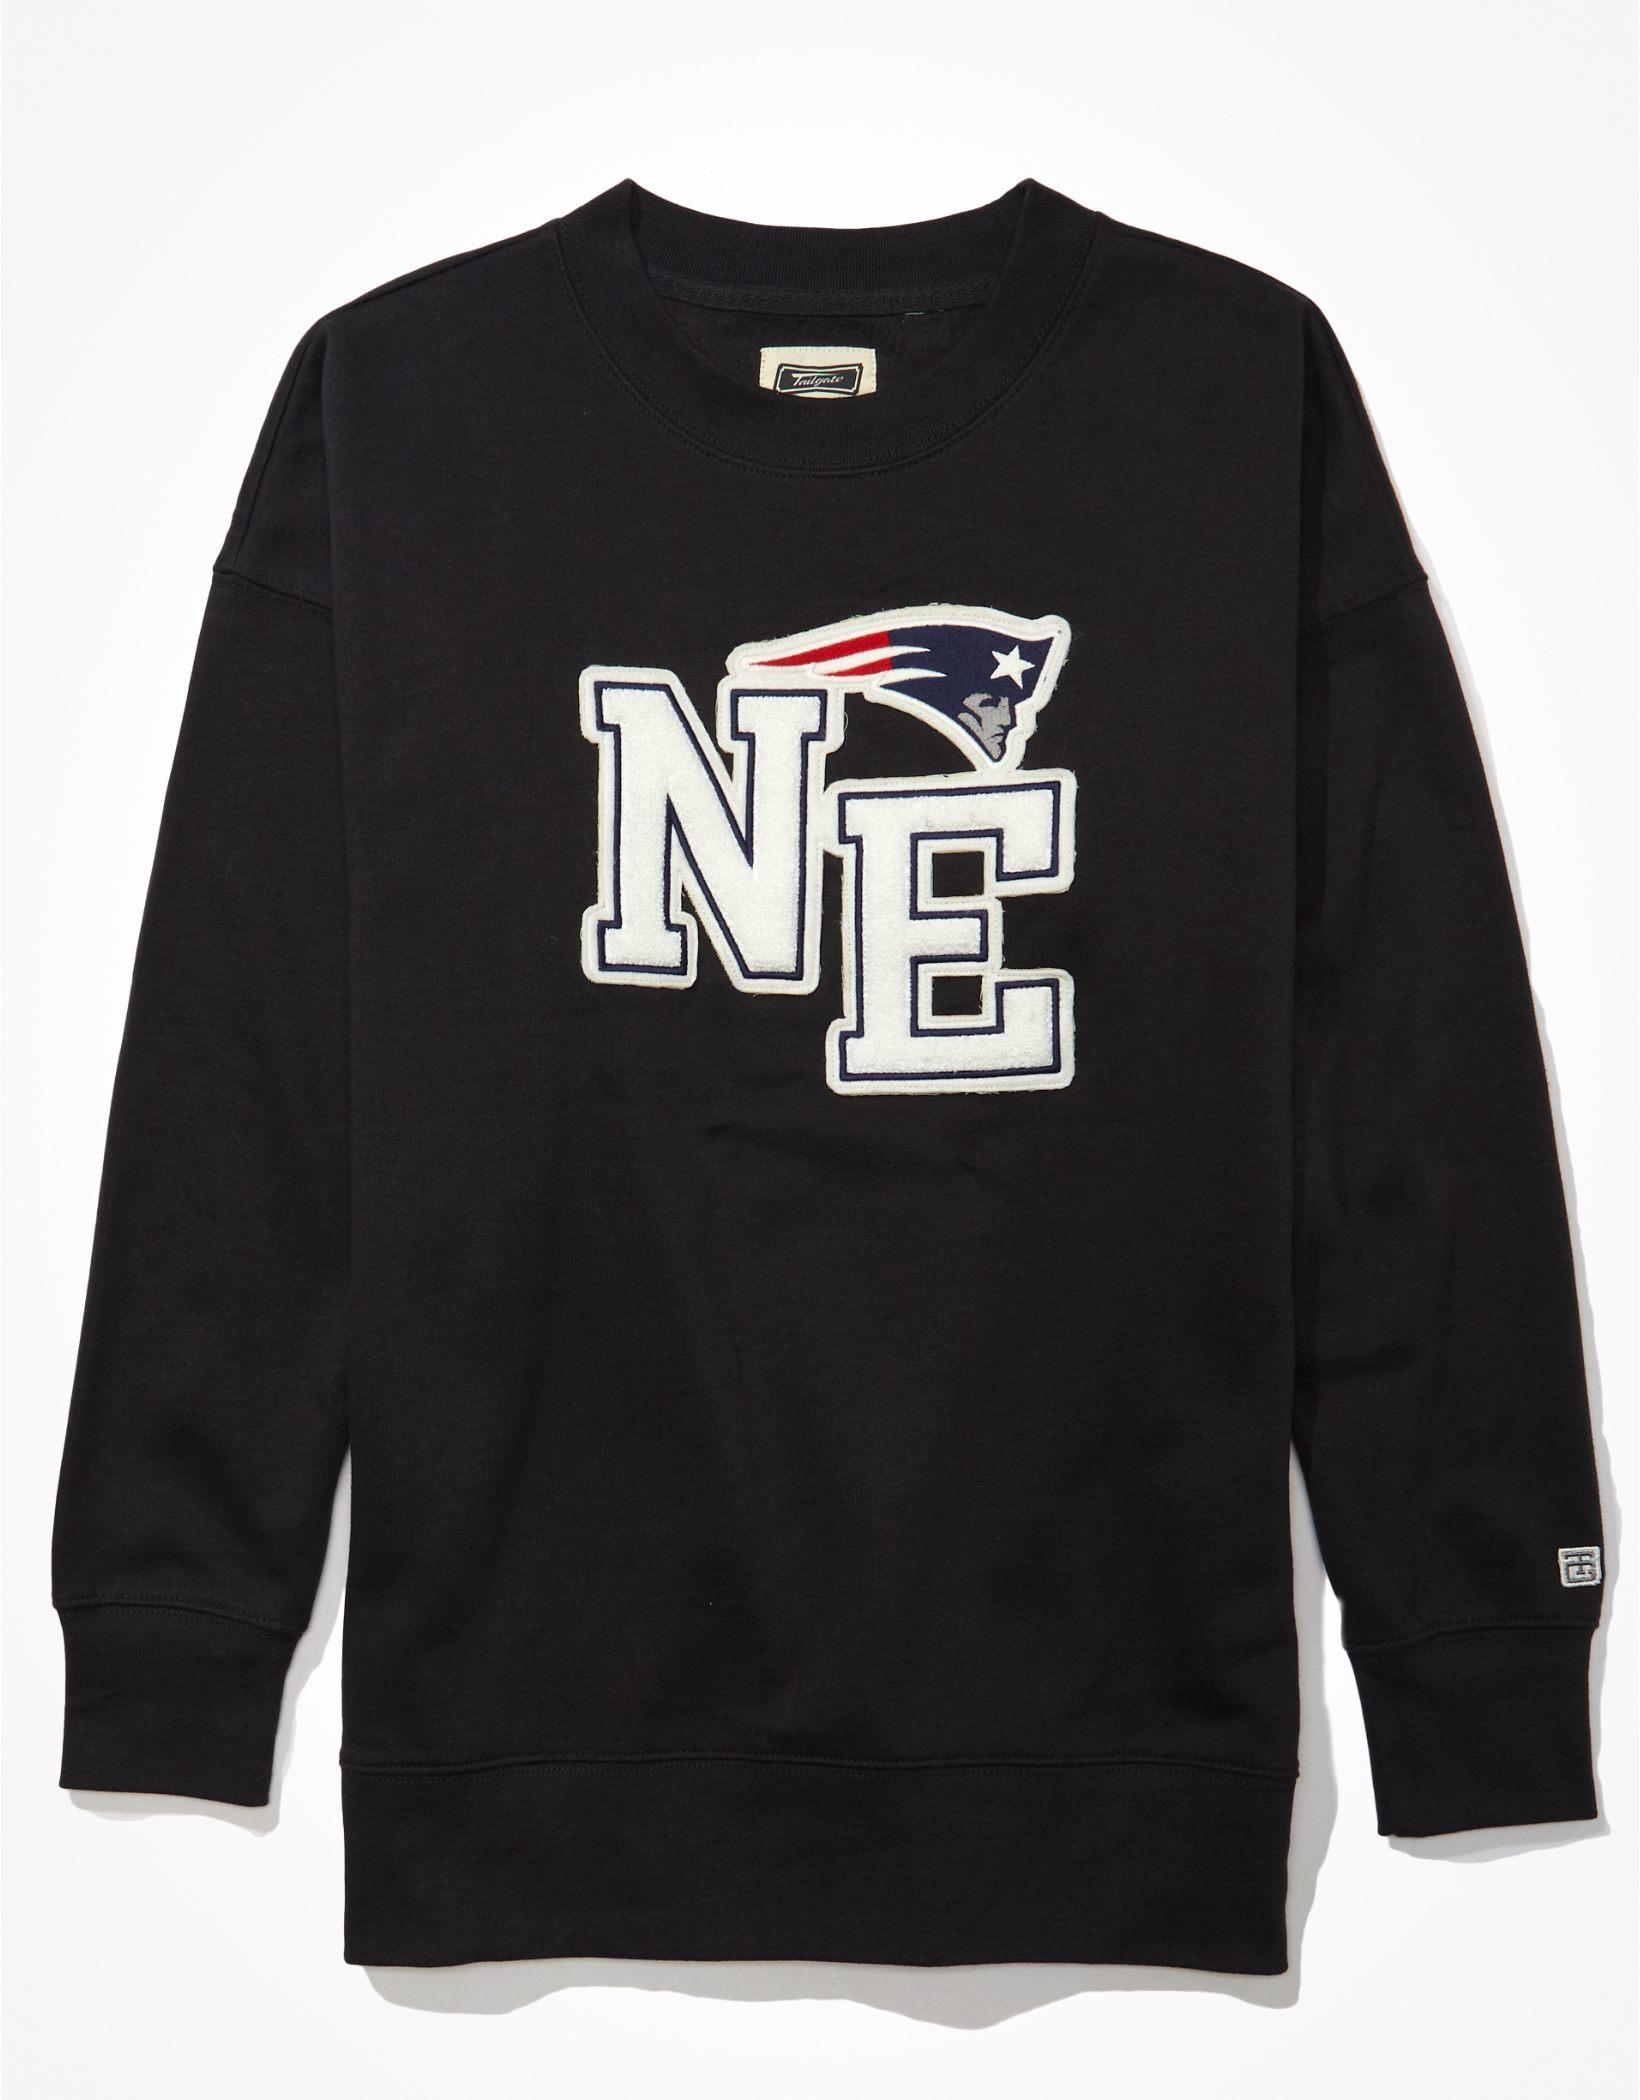 Tailgate Women's New England Patriots Oversized Sweatshirt